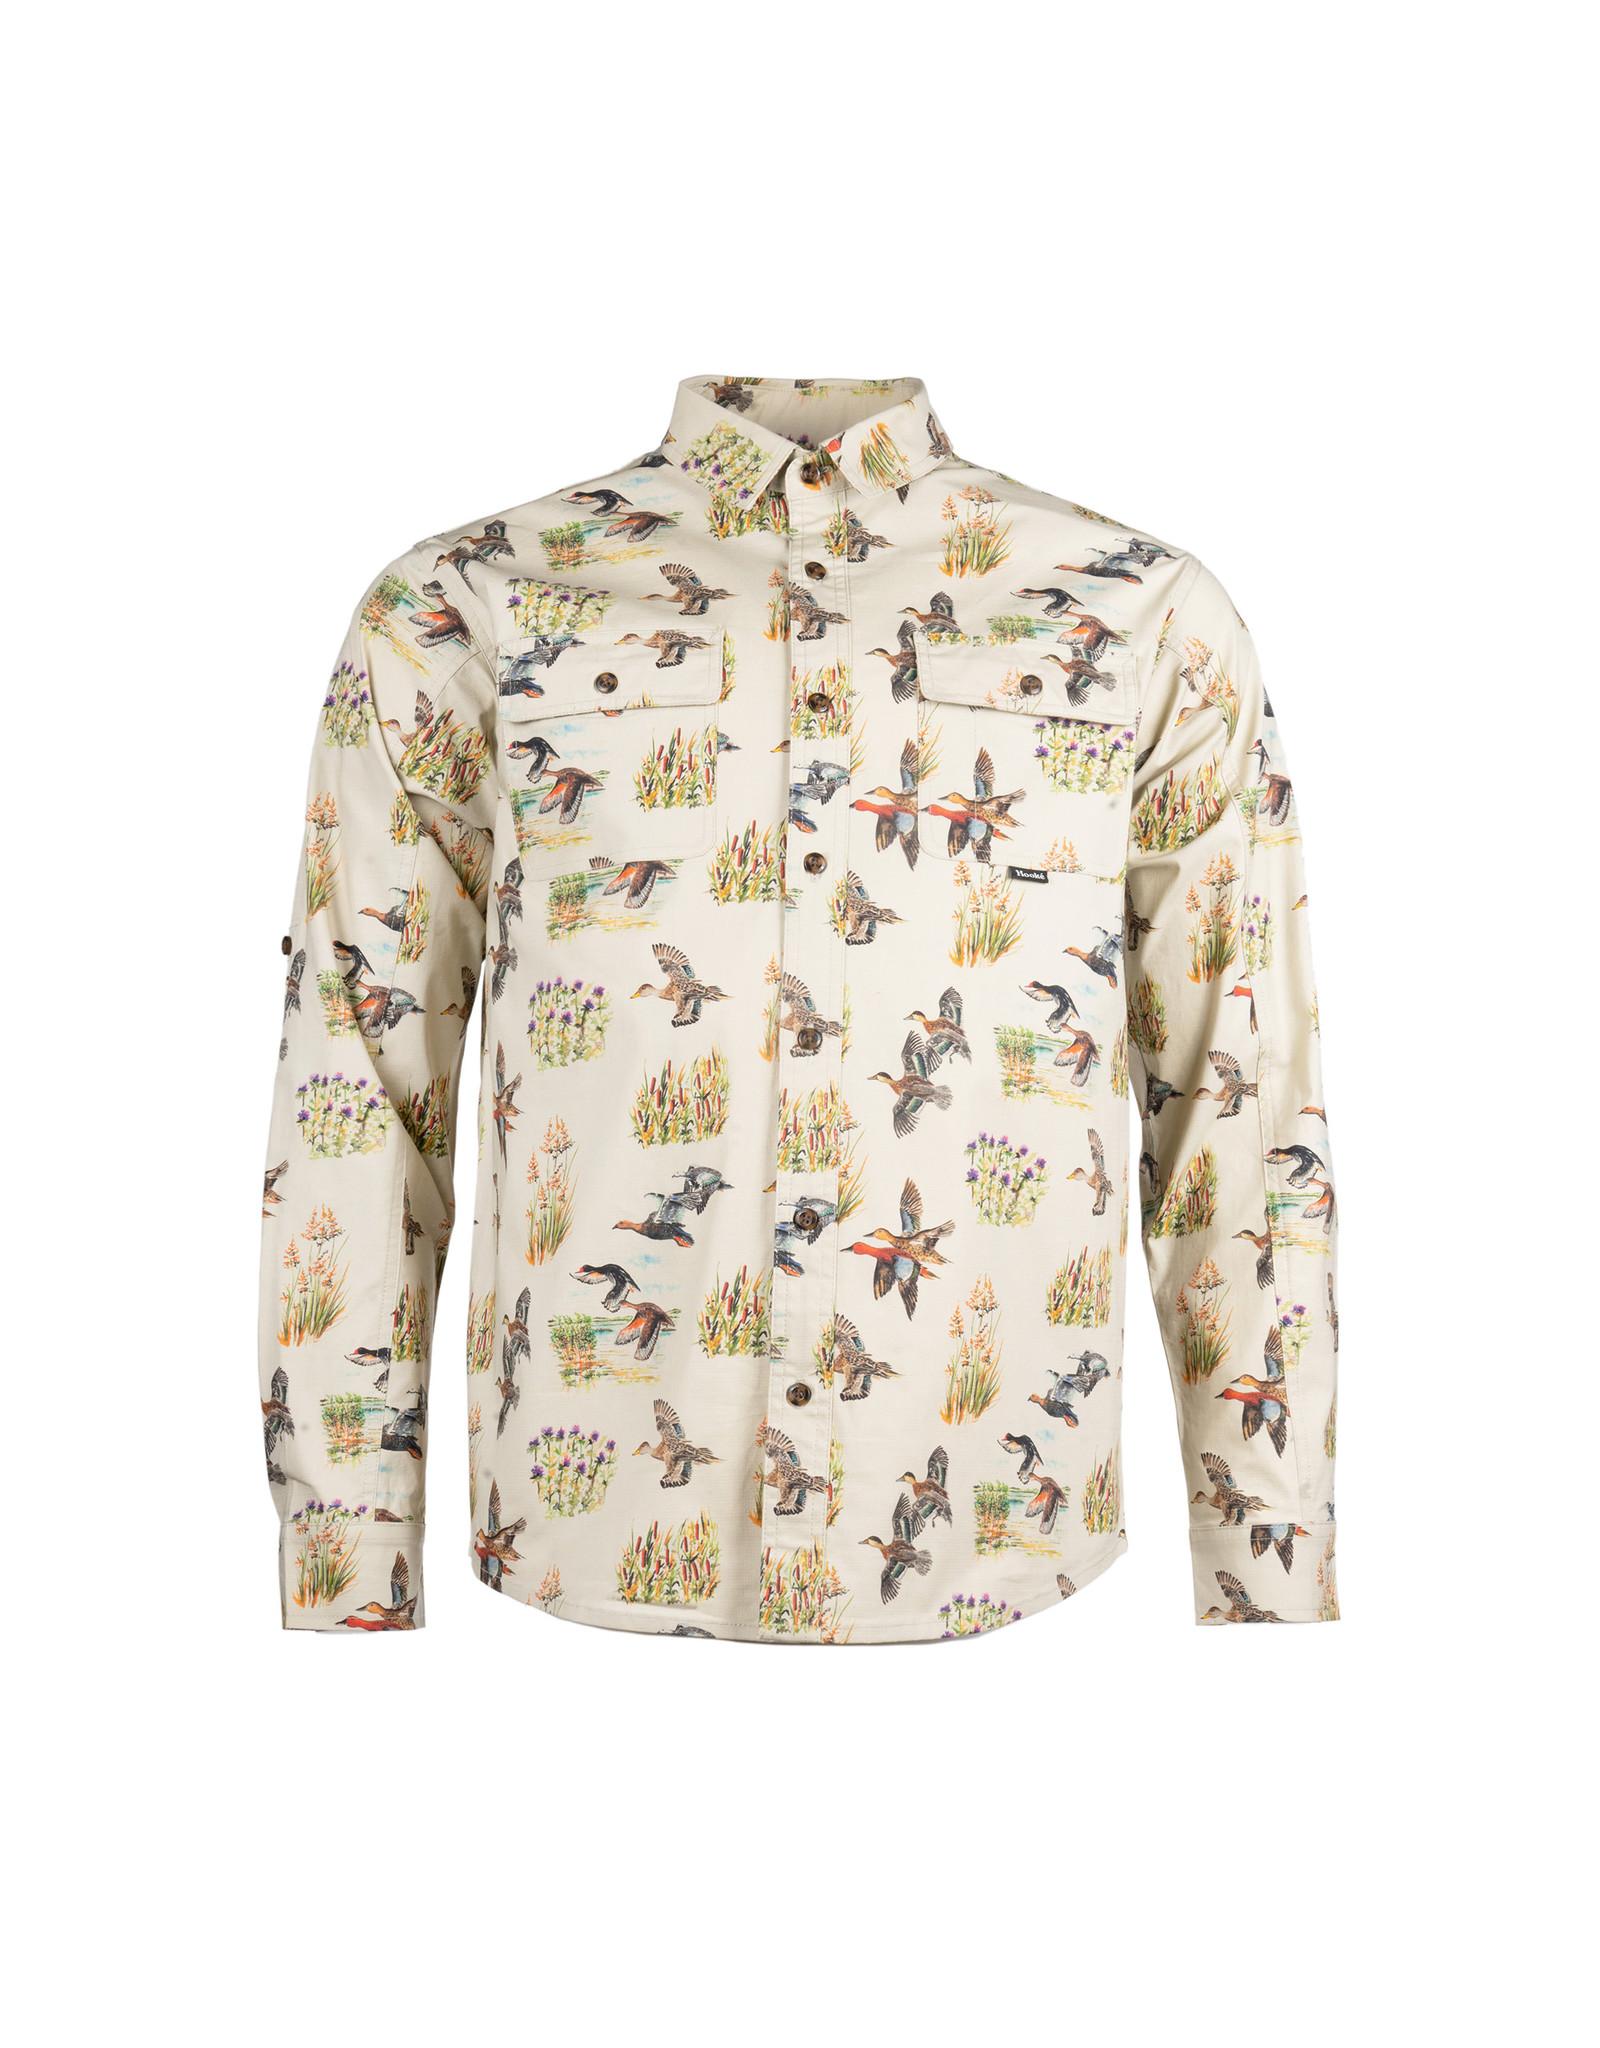 HOOKE Wildfowl shirt